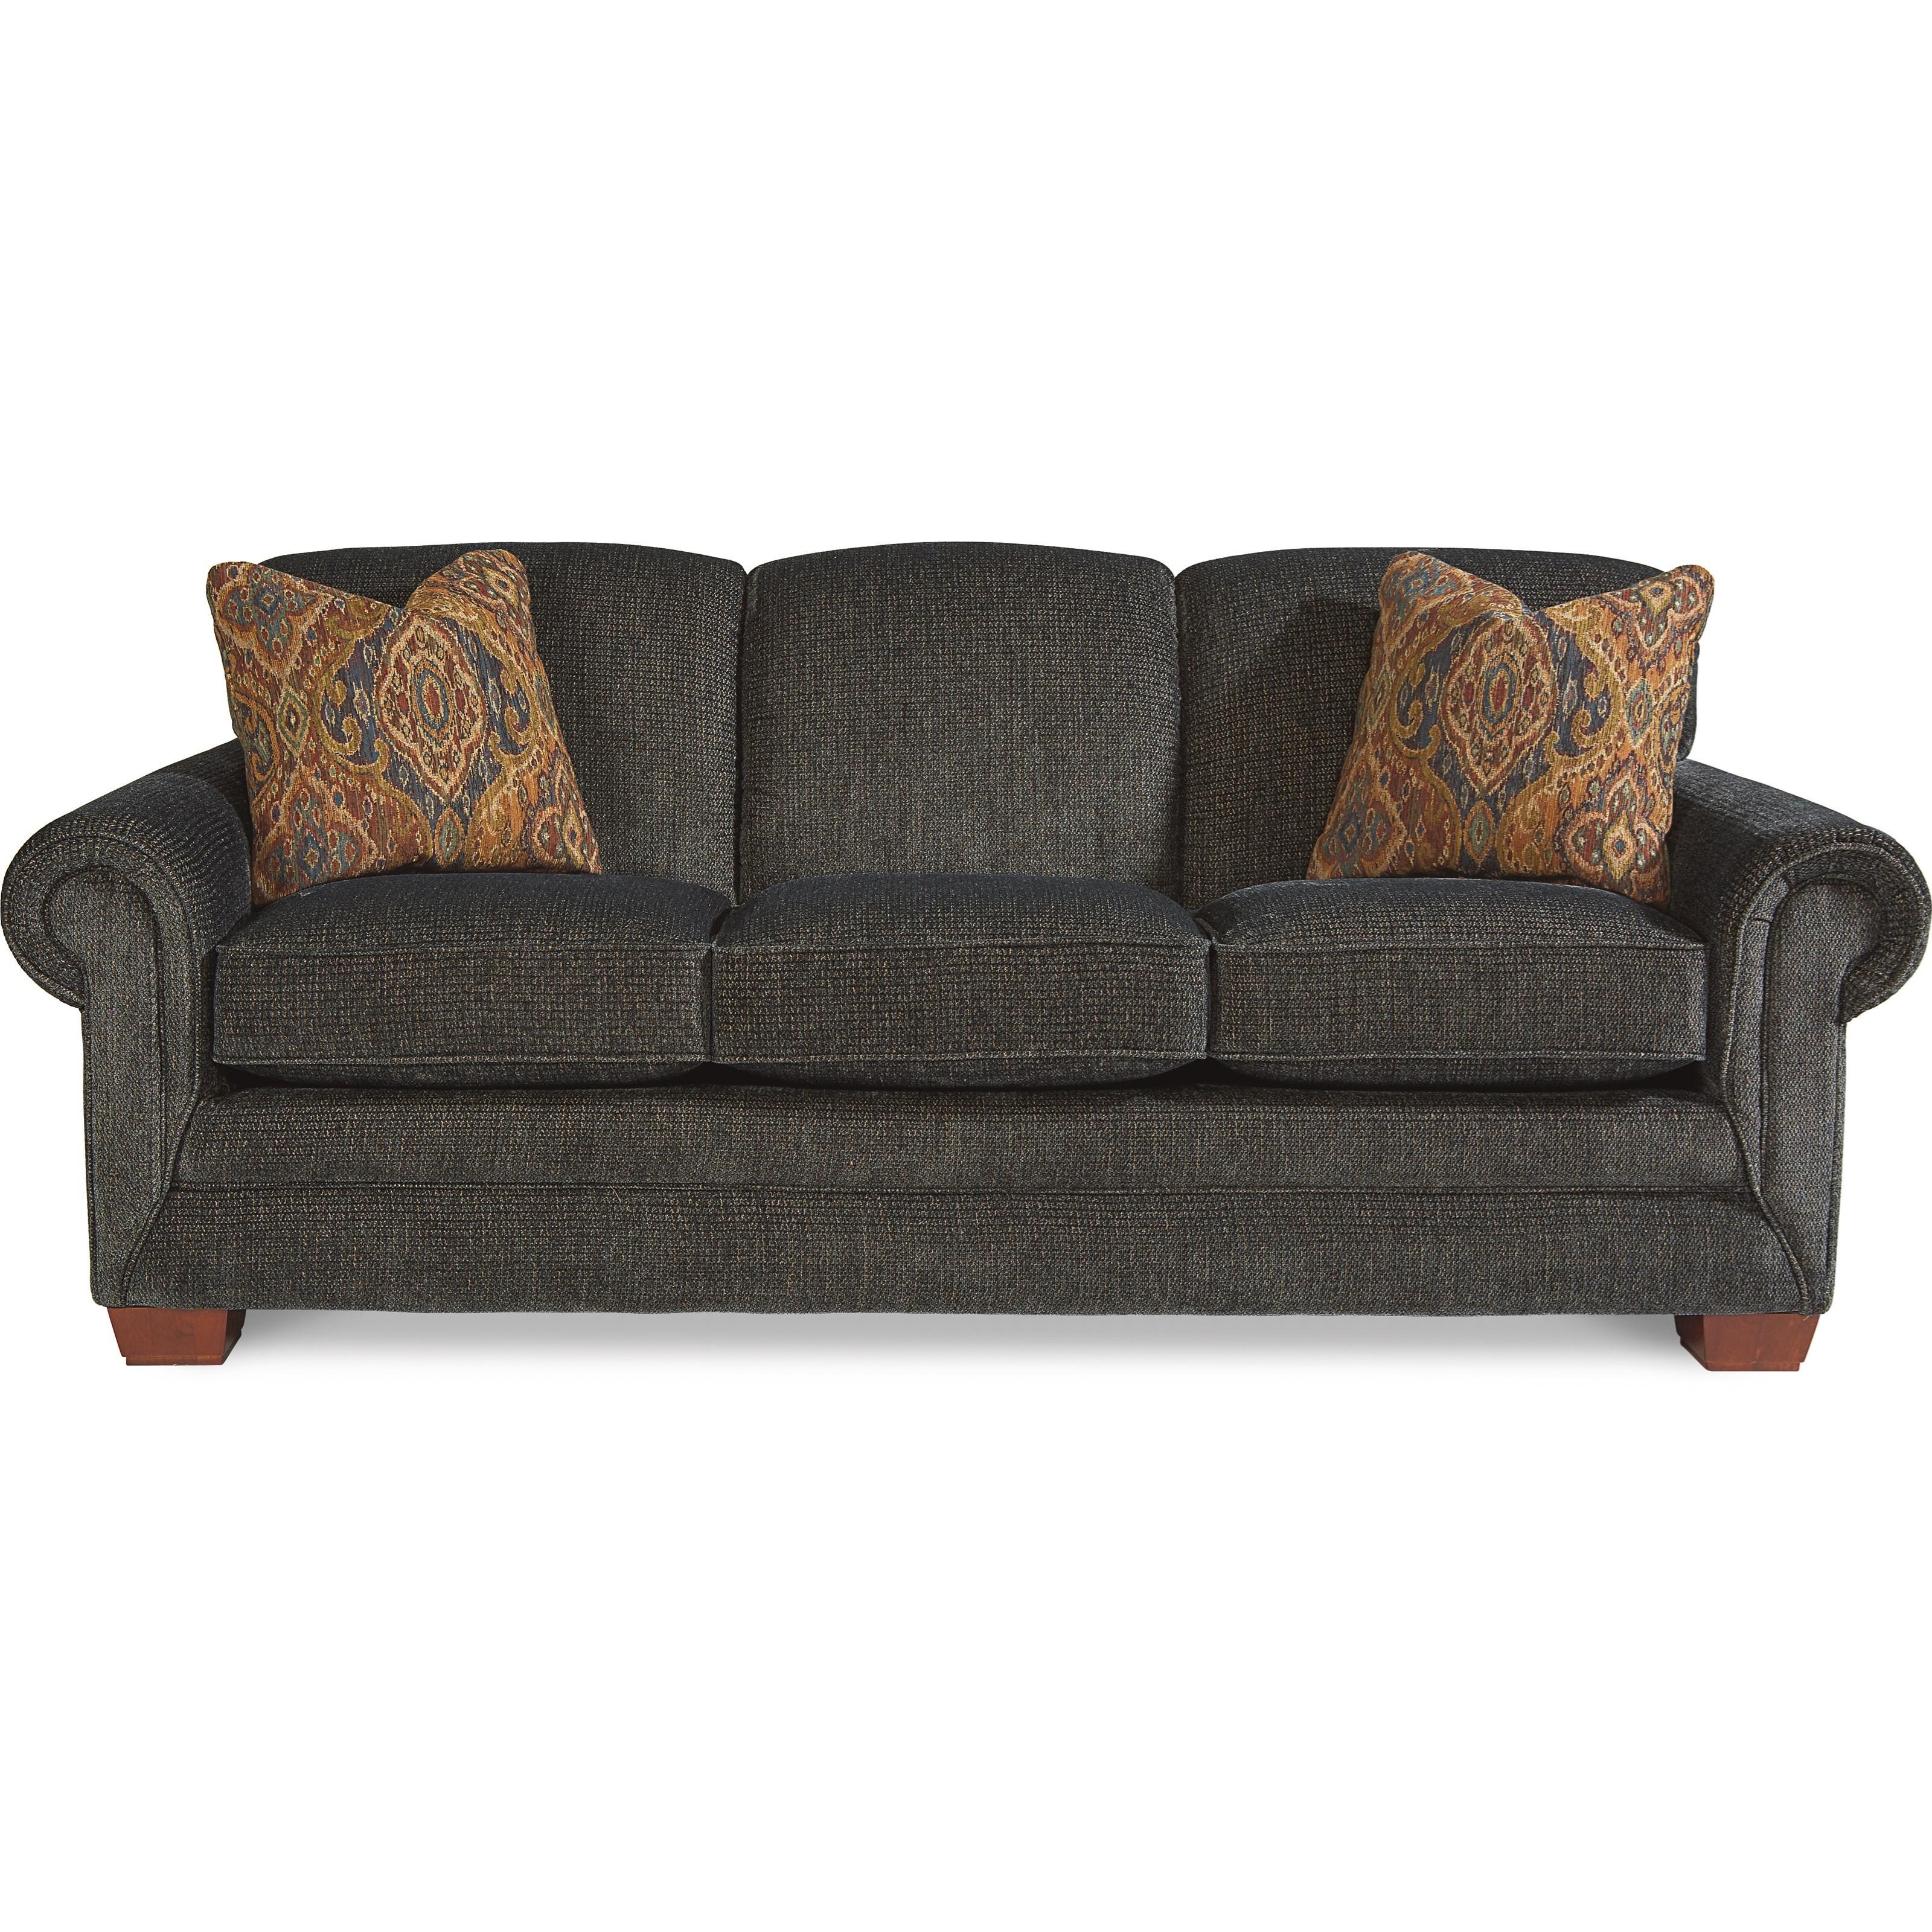 La Z Boy Mackenzie Premier Supreme Comfort Queen Sleep Sofa With Slumberair 174 Mattress Lindy S